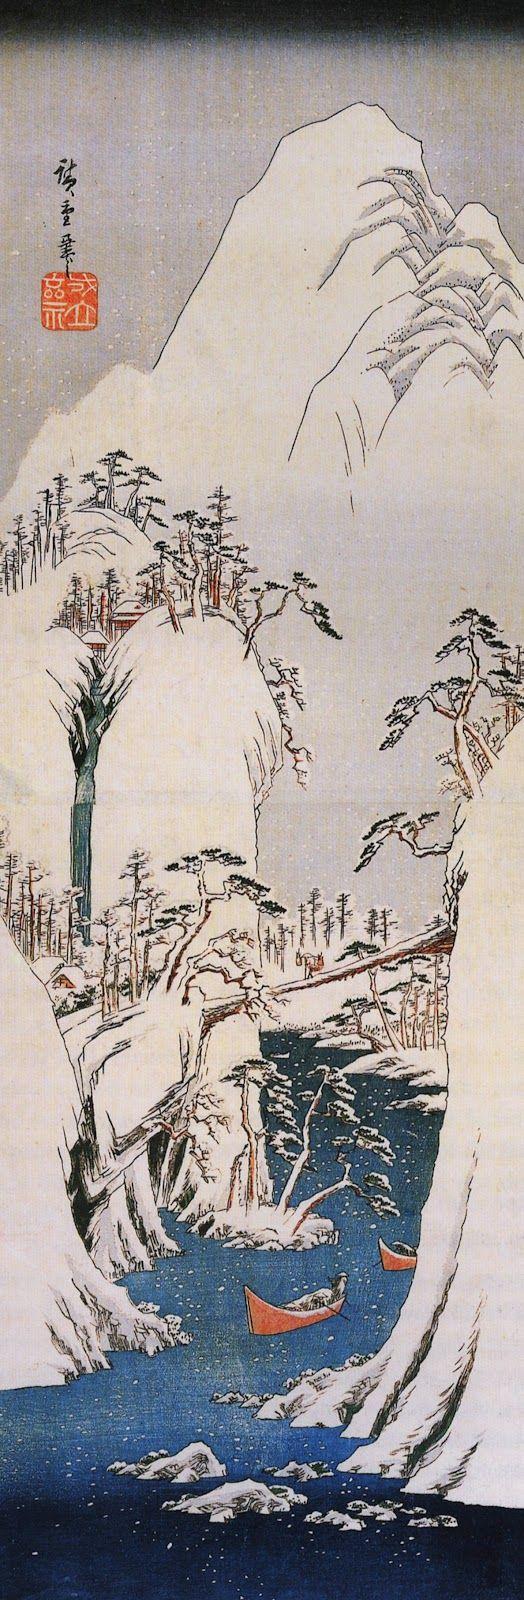 Utagawa Hiroshige. Une gorge enneigée